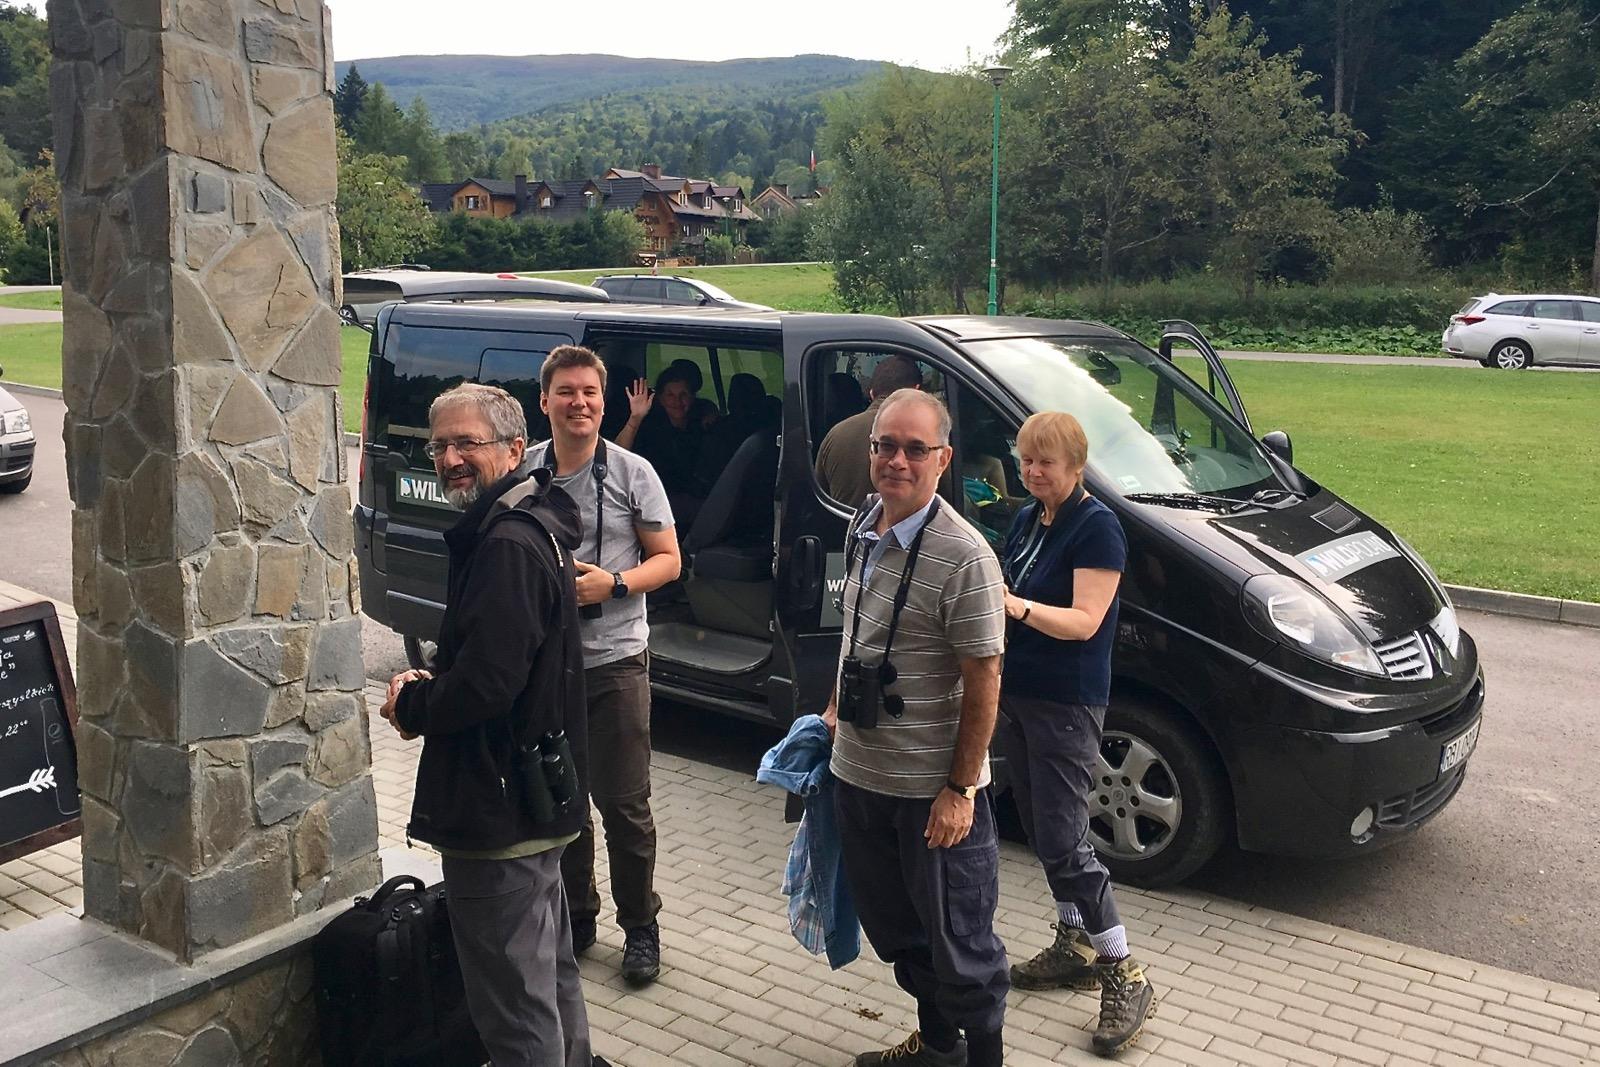 Summer Wildlife Festival Group in the Bieszczady Mts, Eastern Carpathians